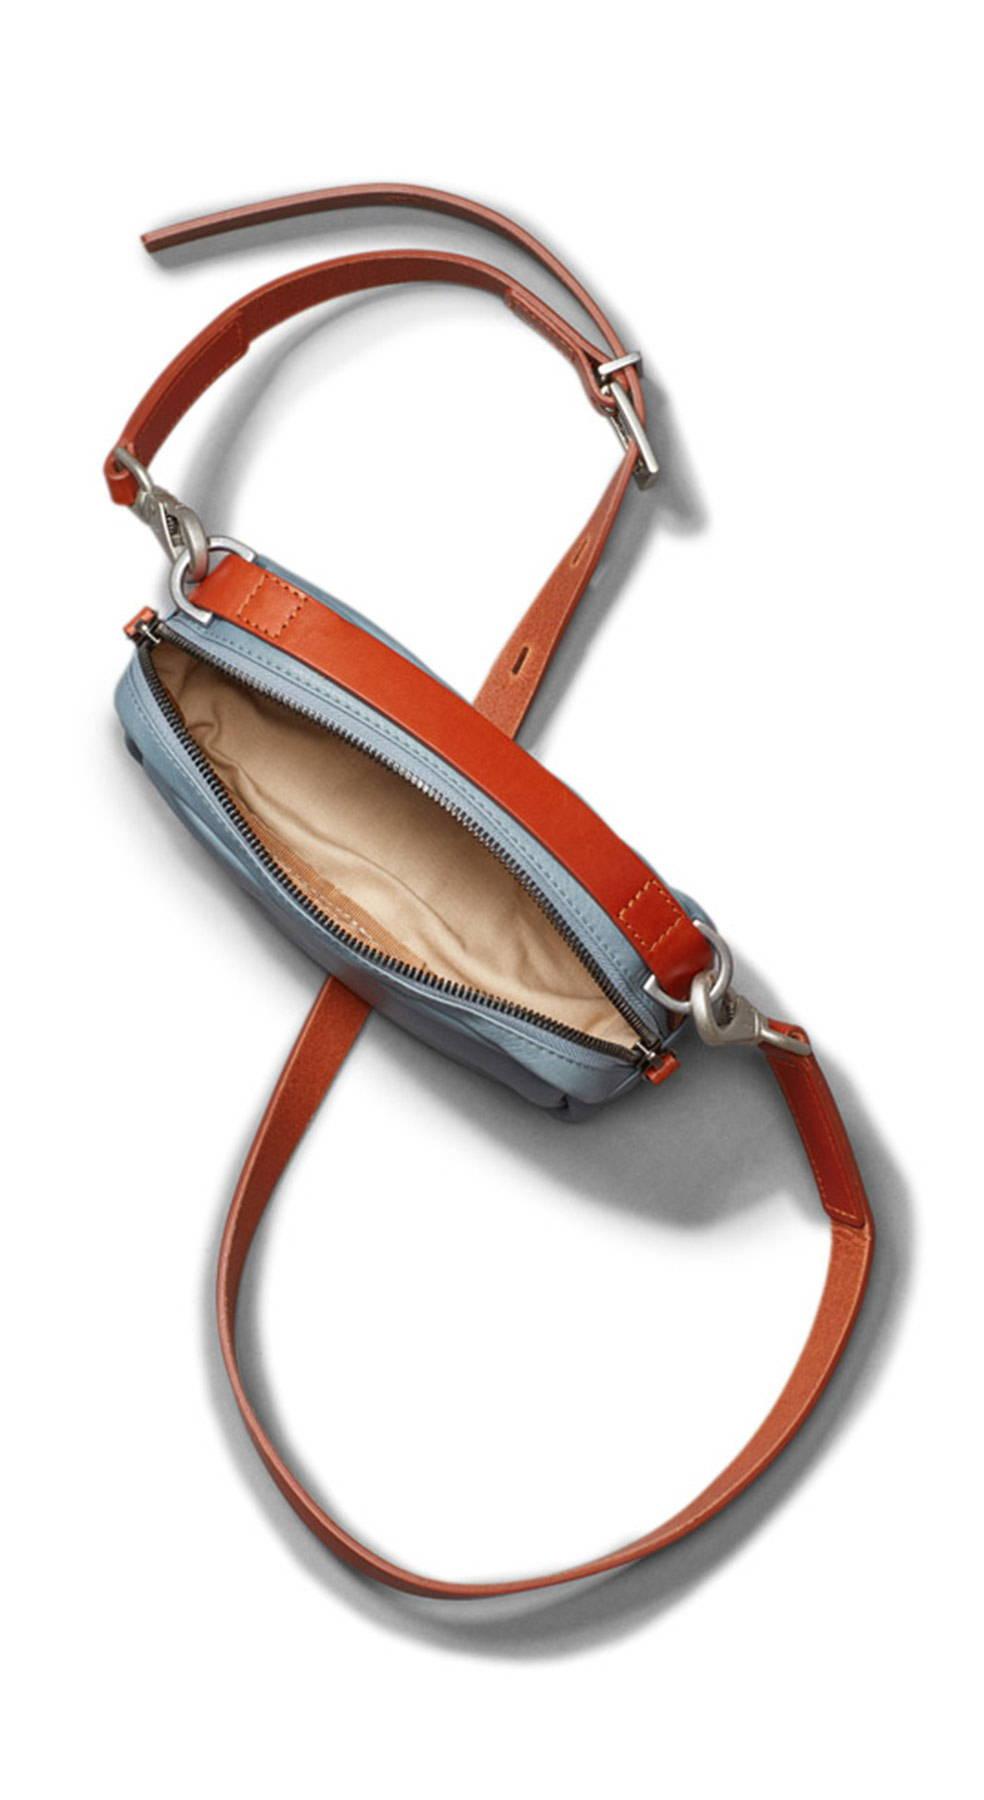 Limited Edition Leila Small Leather Crossbody Bag in Denim Inside